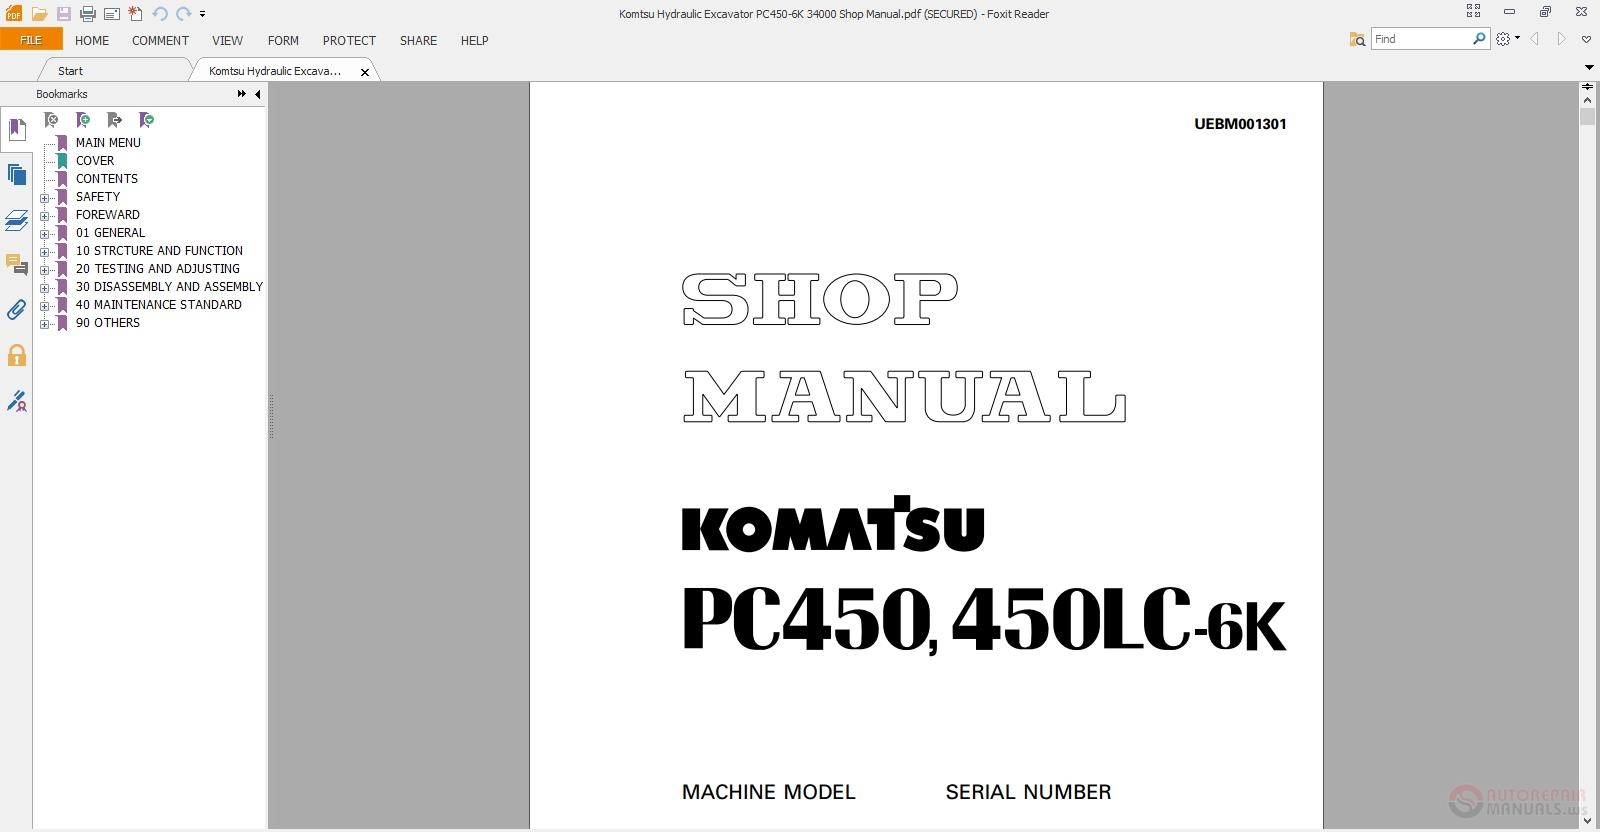 komatsu hydraulic excavator pc450 6k 34000 shop manual. Black Bedroom Furniture Sets. Home Design Ideas